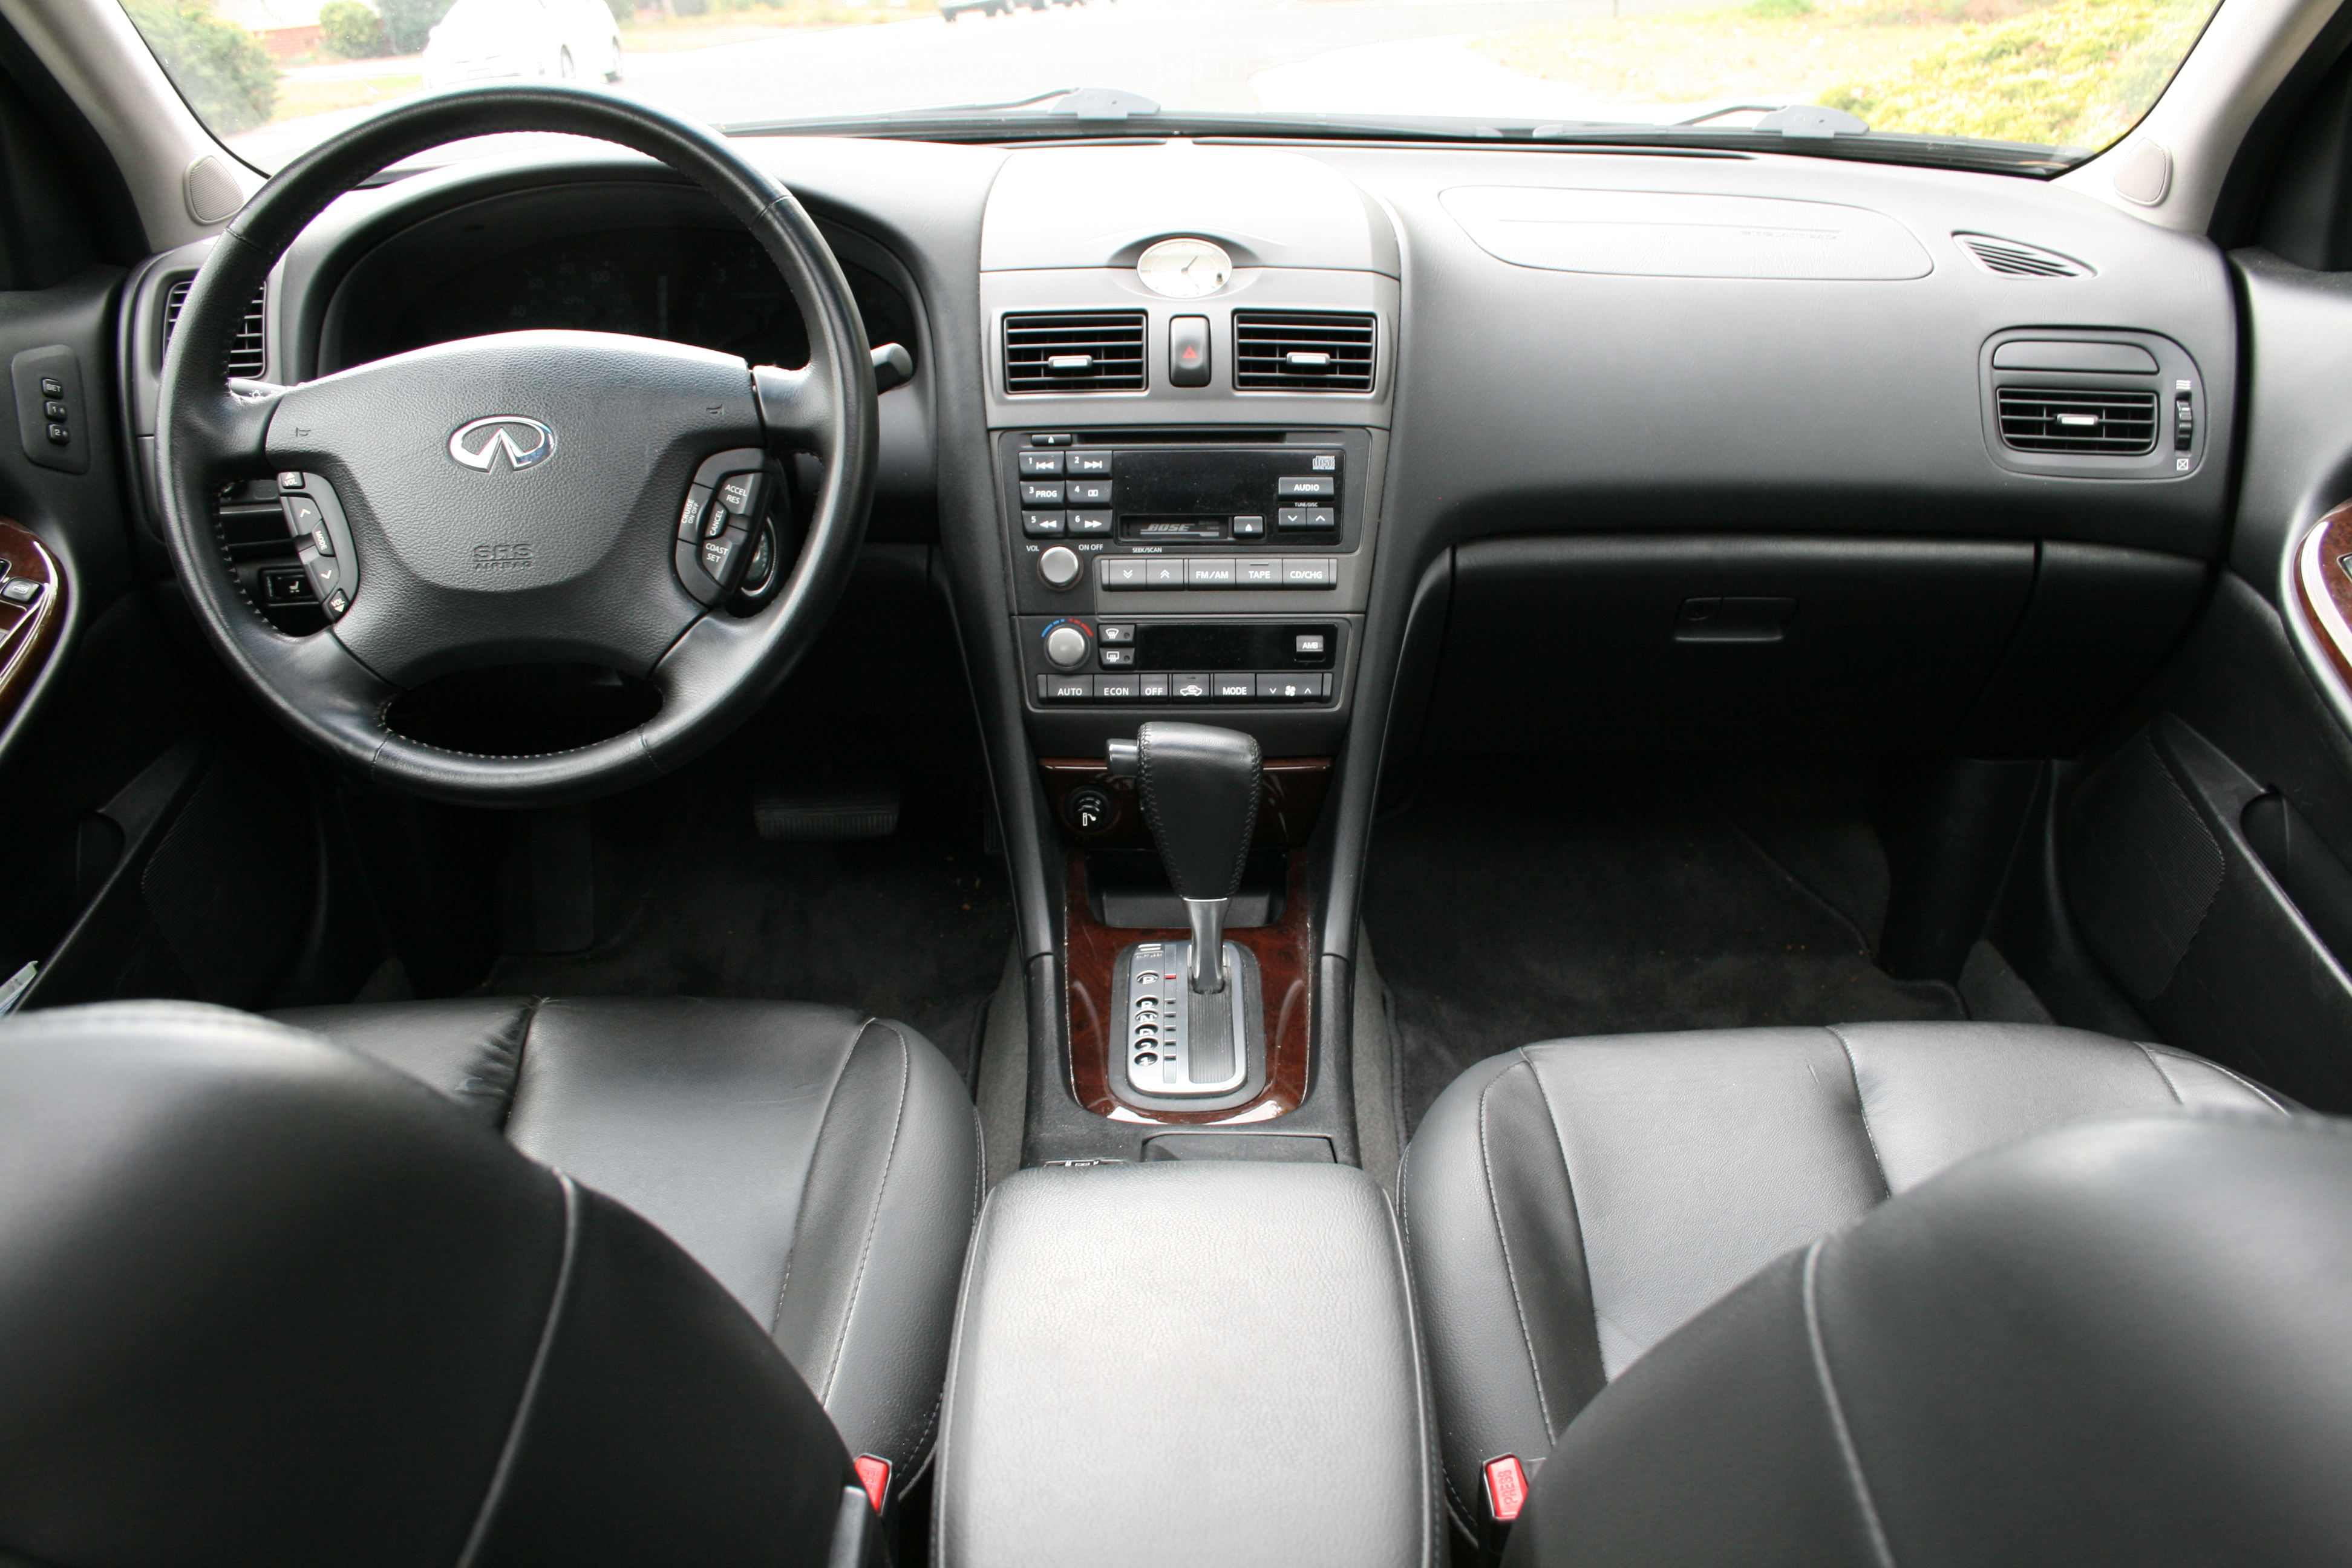 Infiniti i30 interior